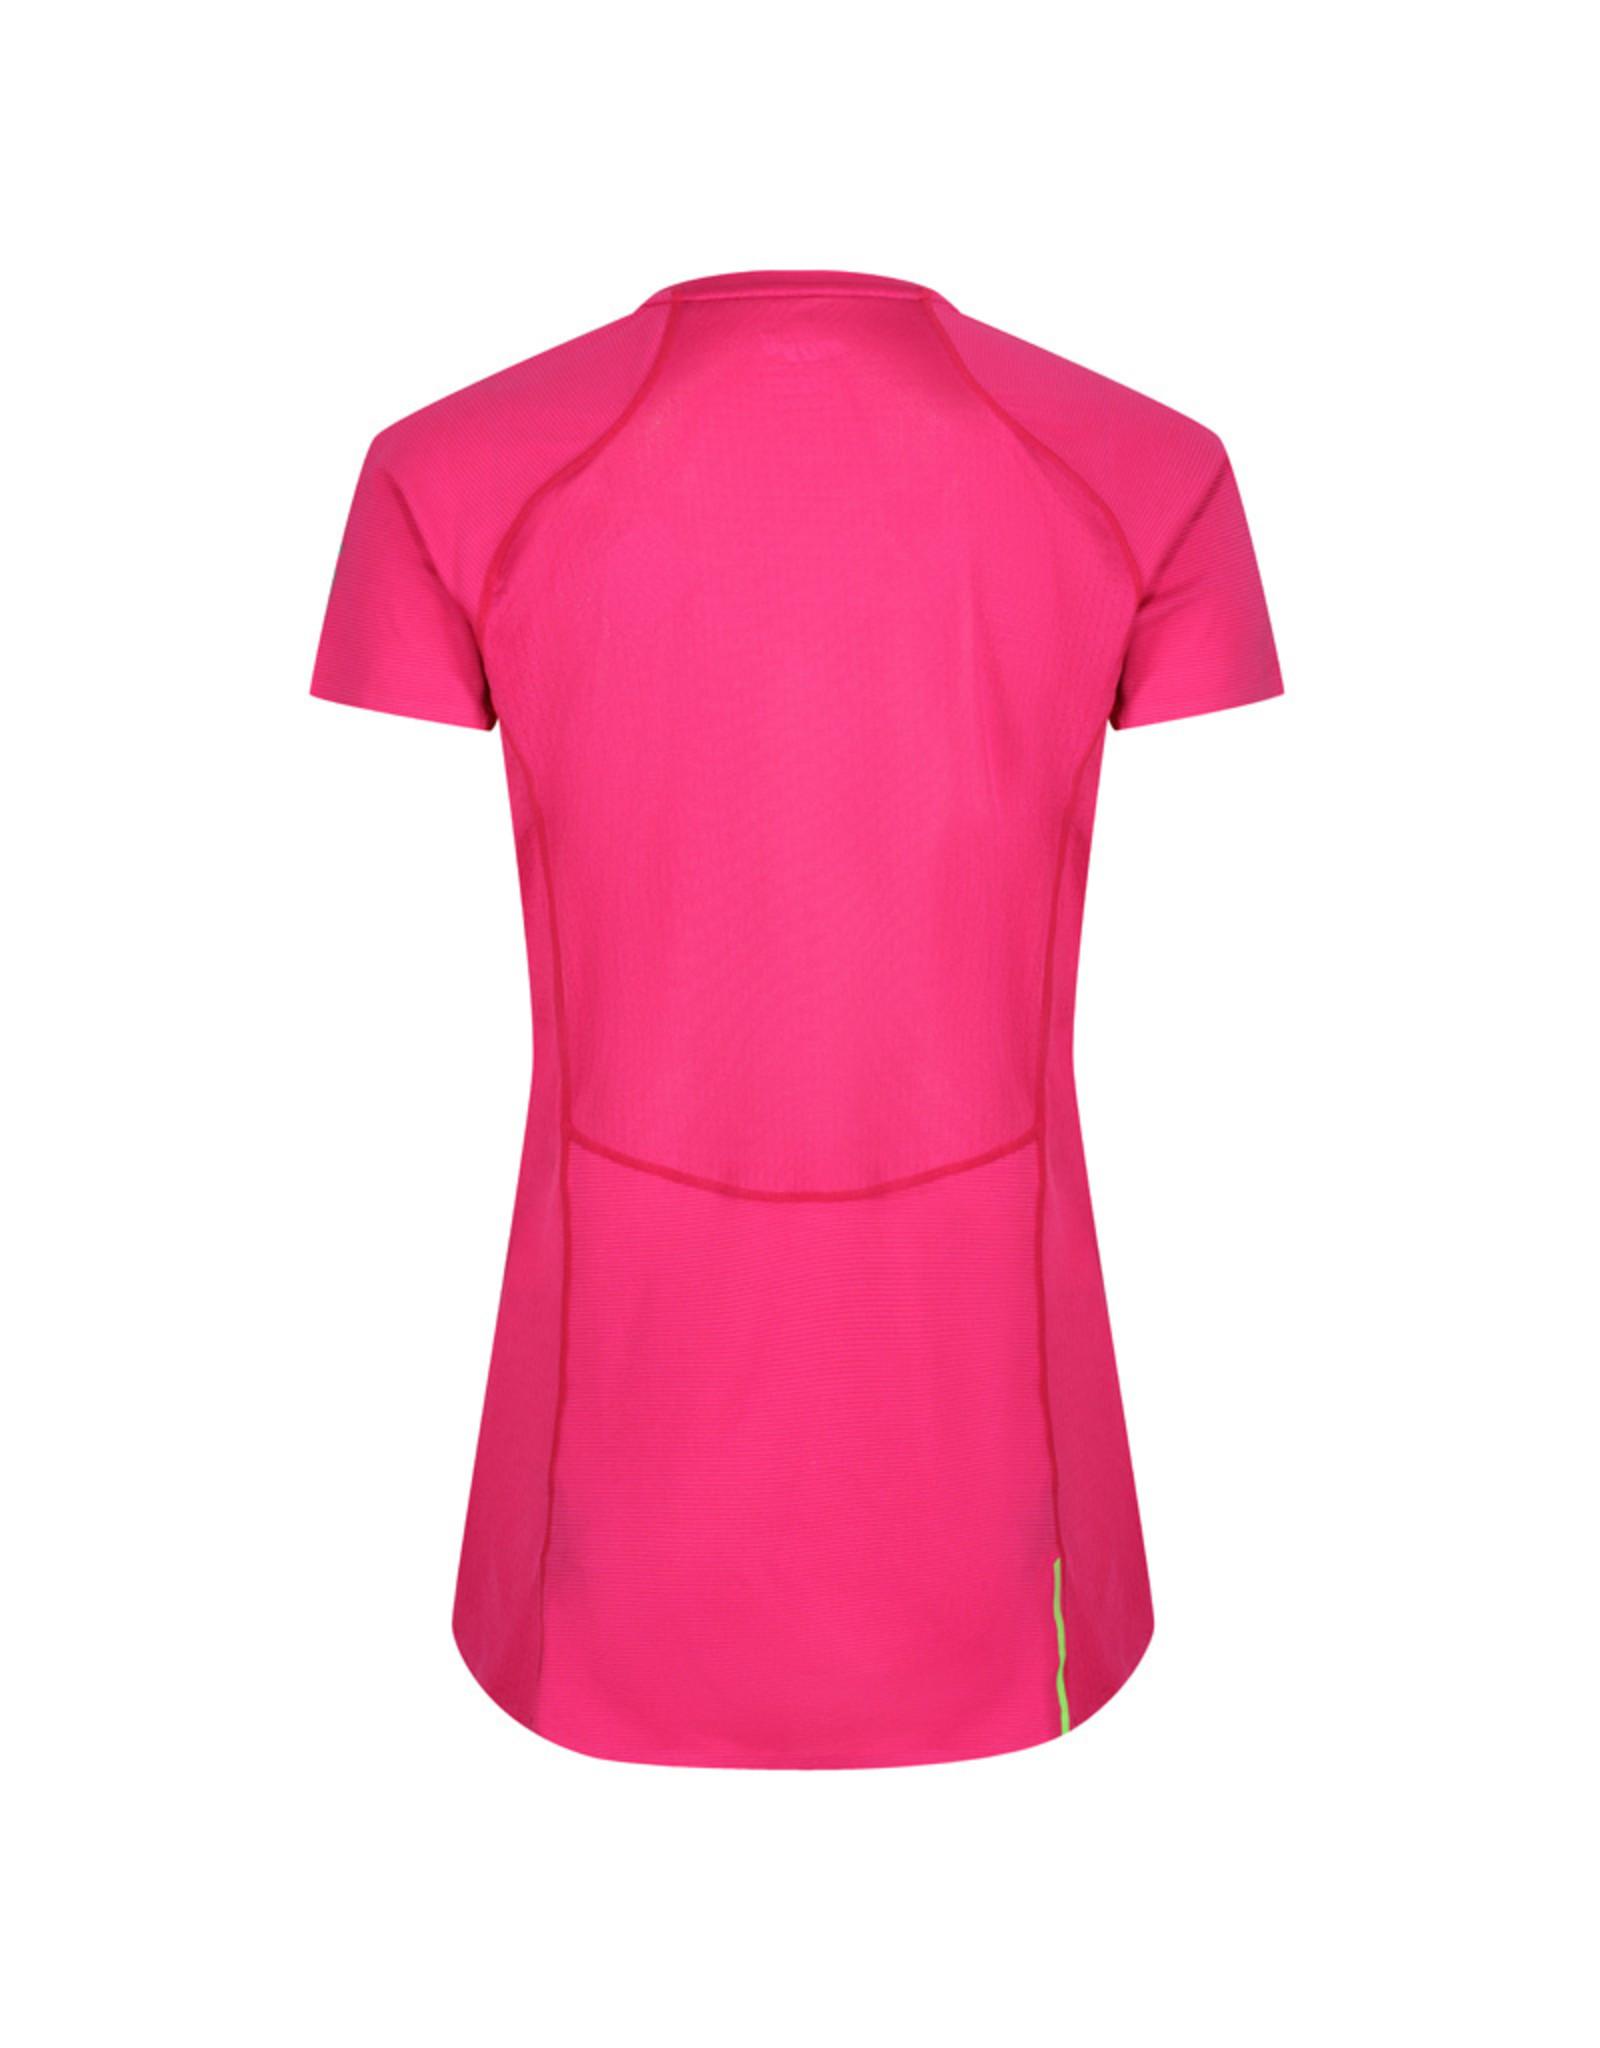 Inov-8 Base Elite Shirt Manche Courte - Rose